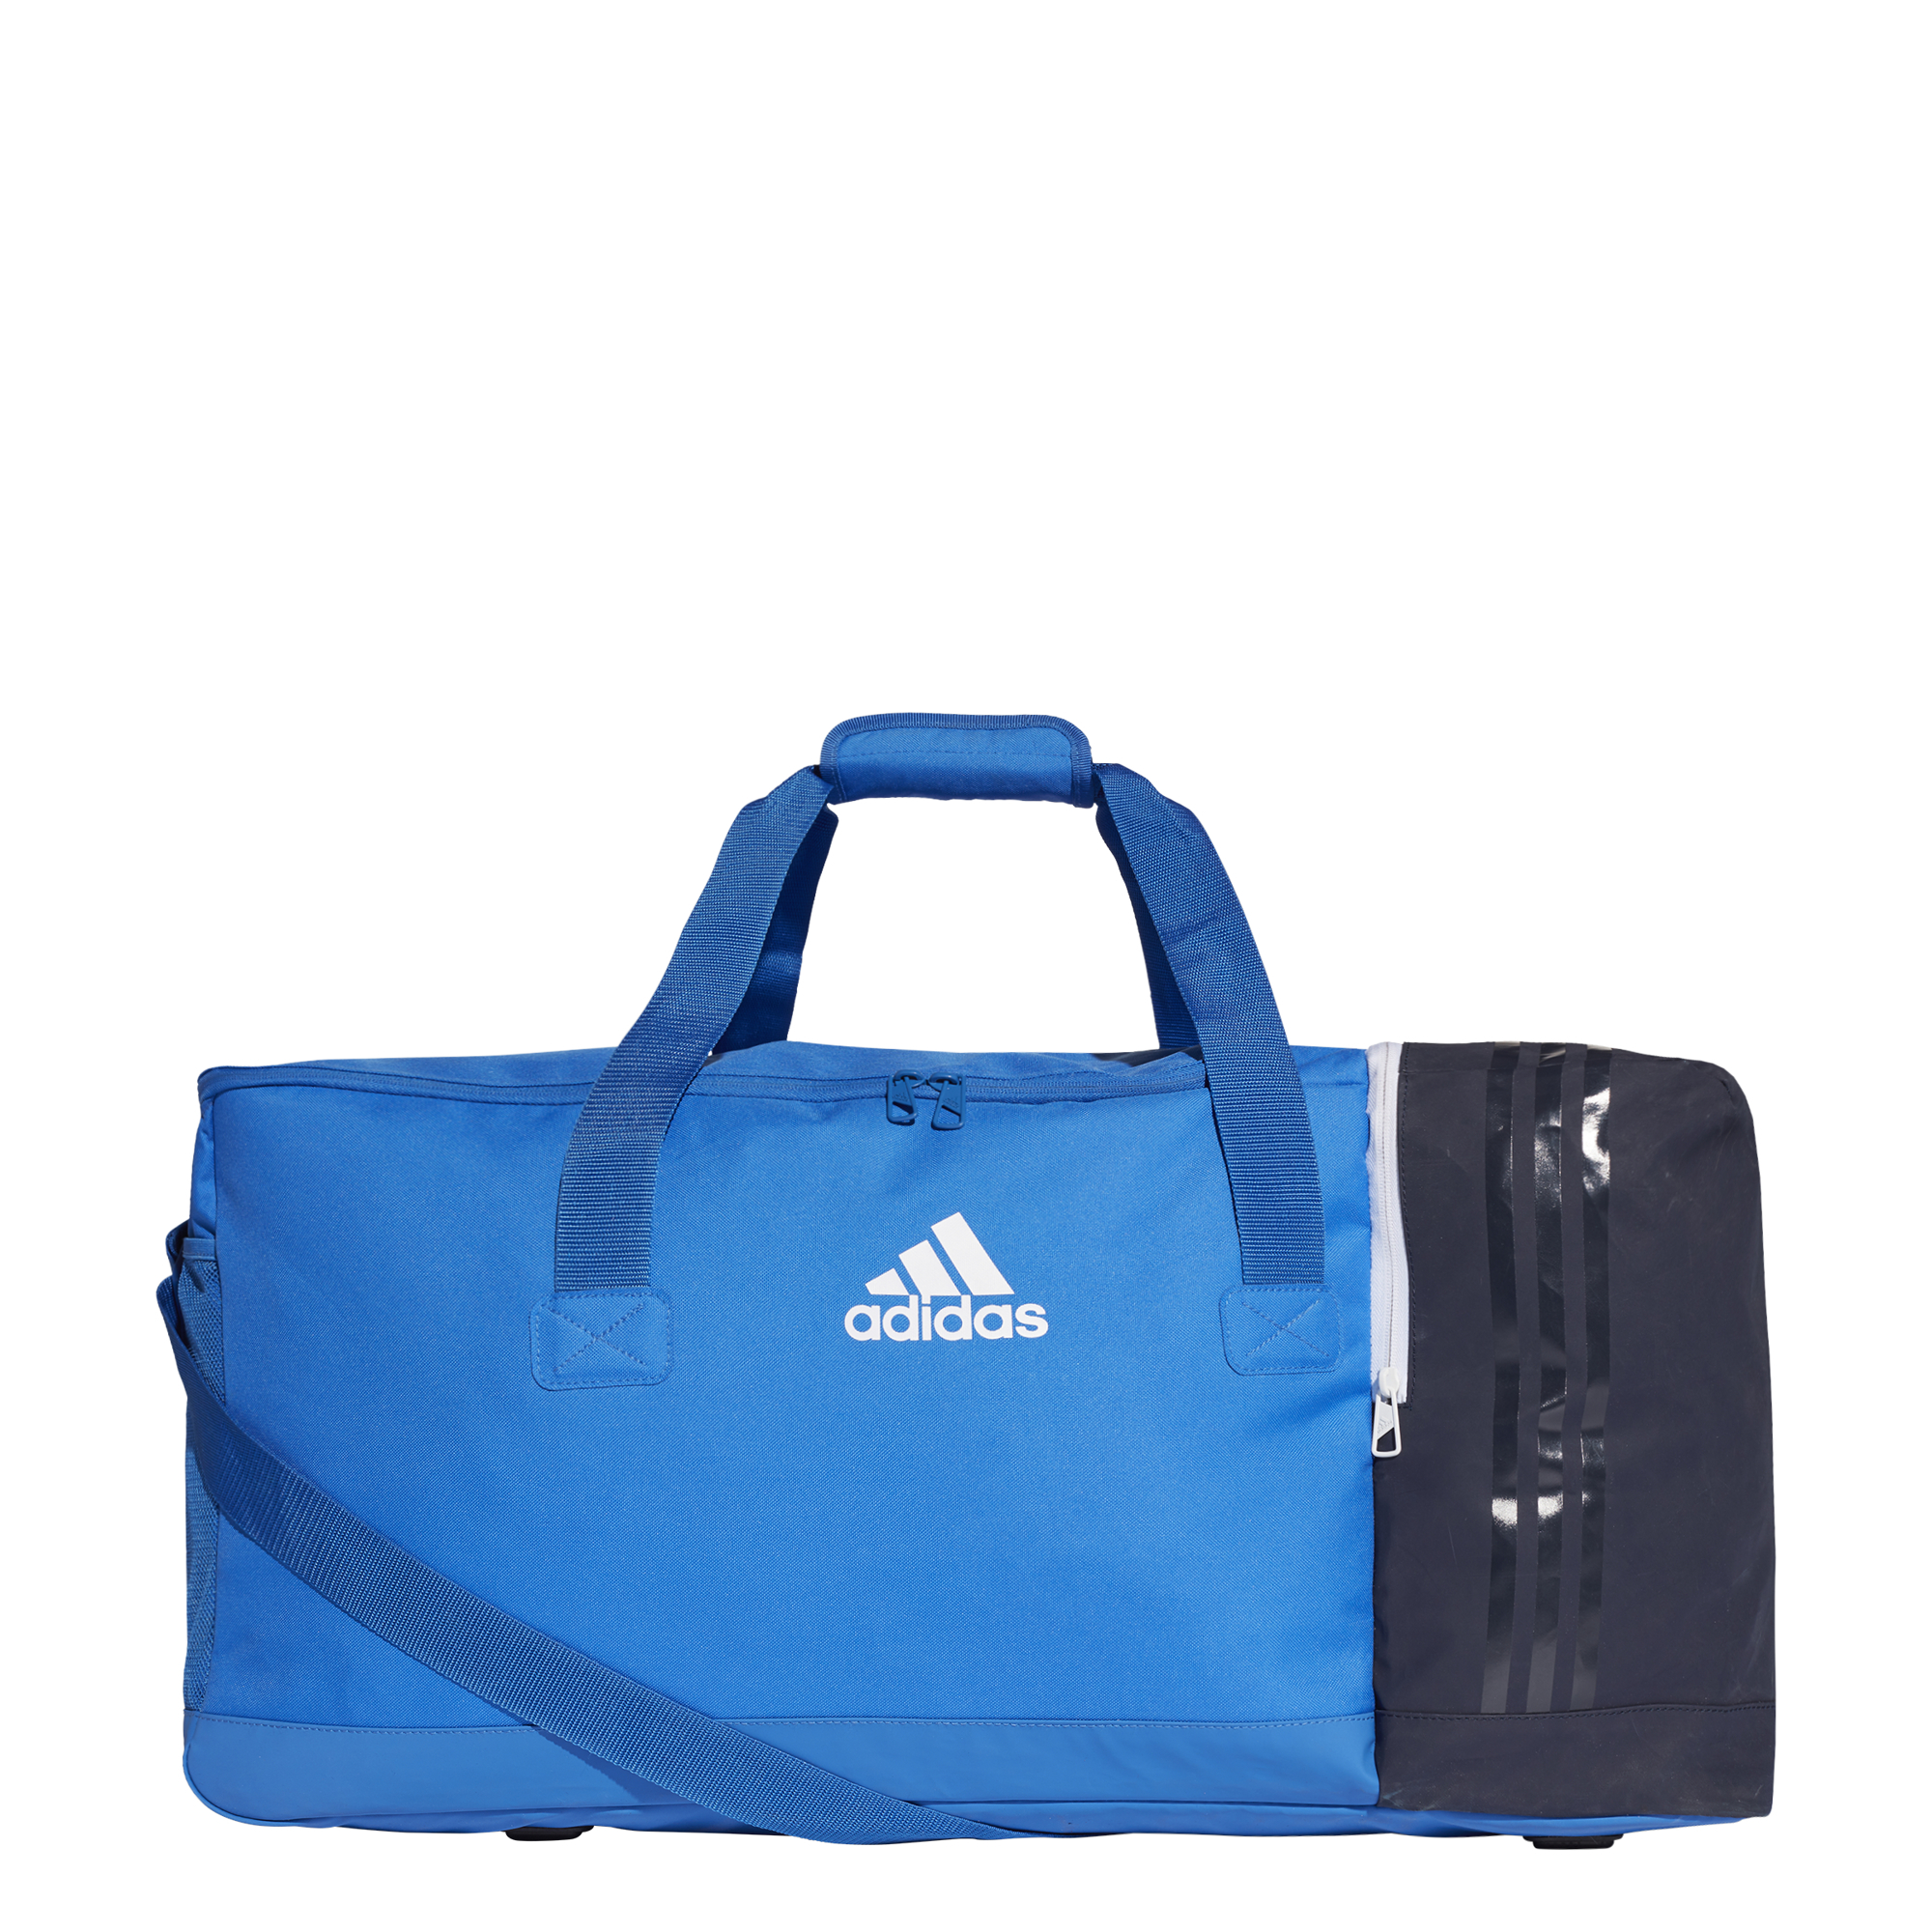 a051f44d58268 adidas Tiro Teambag - Large - Sporttasche mit Schuhfach - BS4743 blau 001